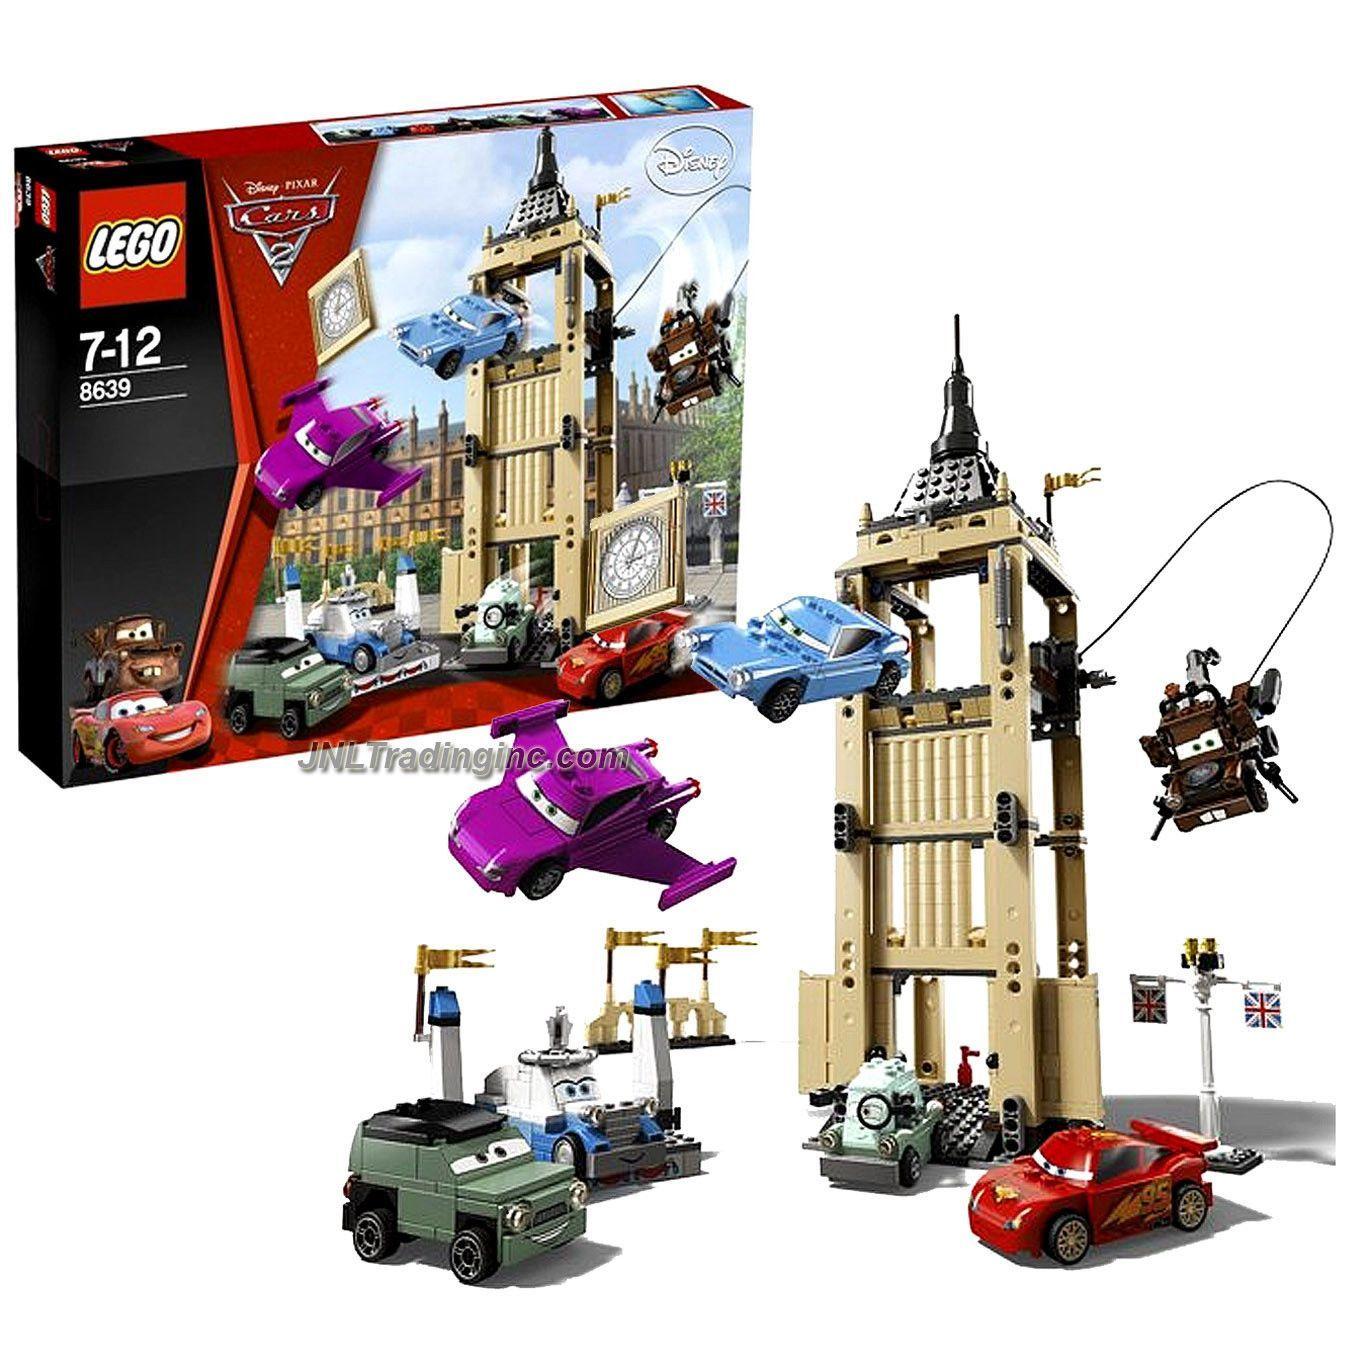 "Lego Disney Pixar ""Cars 2"" Set 8639 BIG BENTLEY BUST"